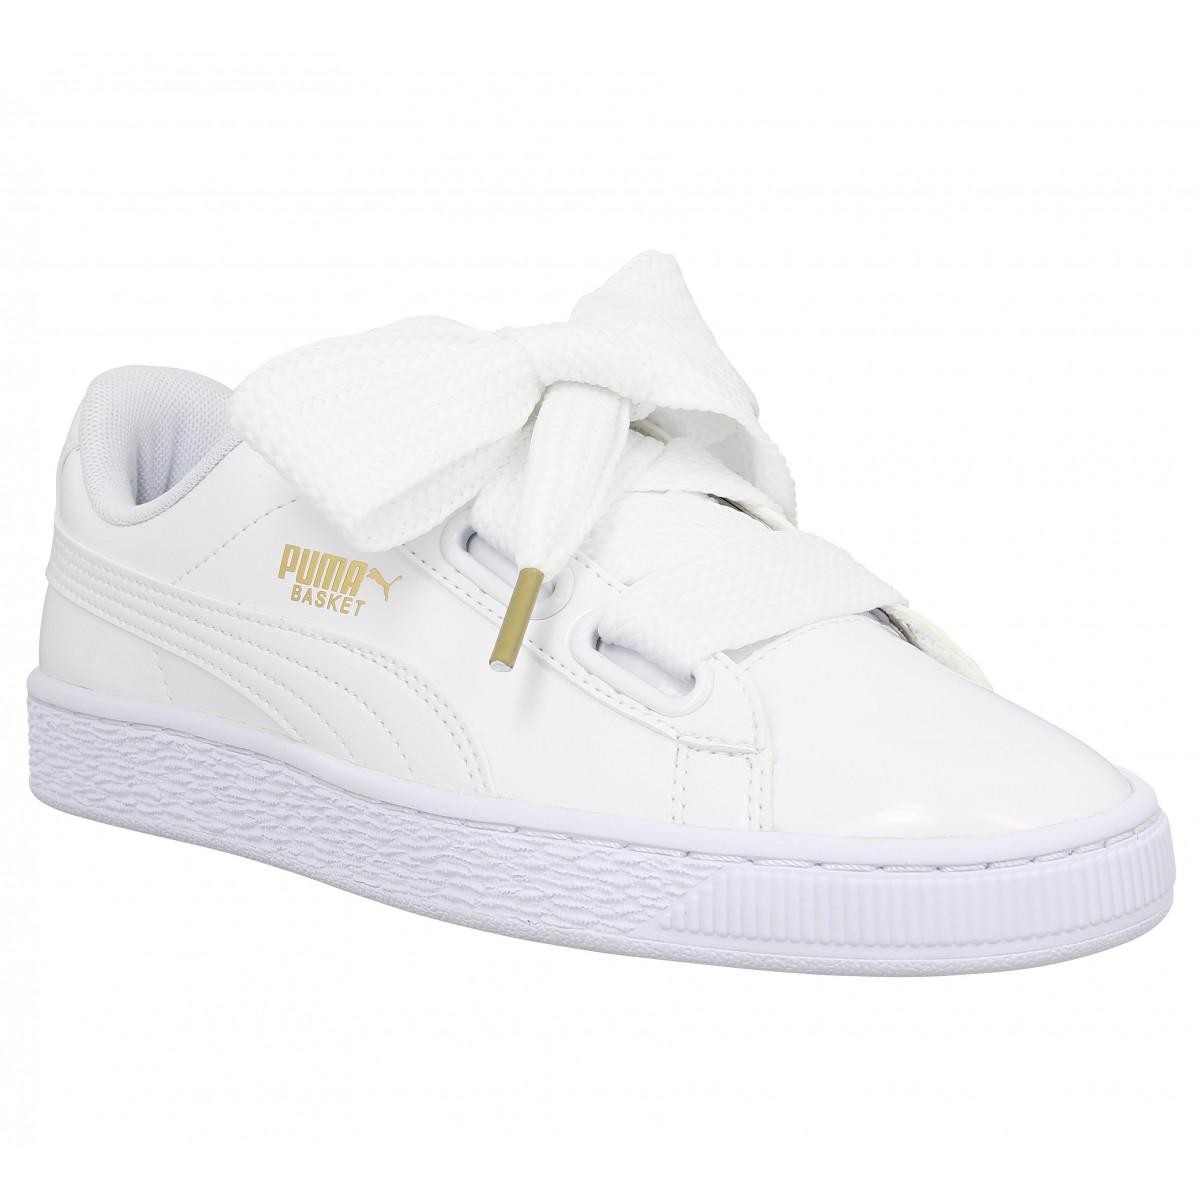 chaussure puma femme